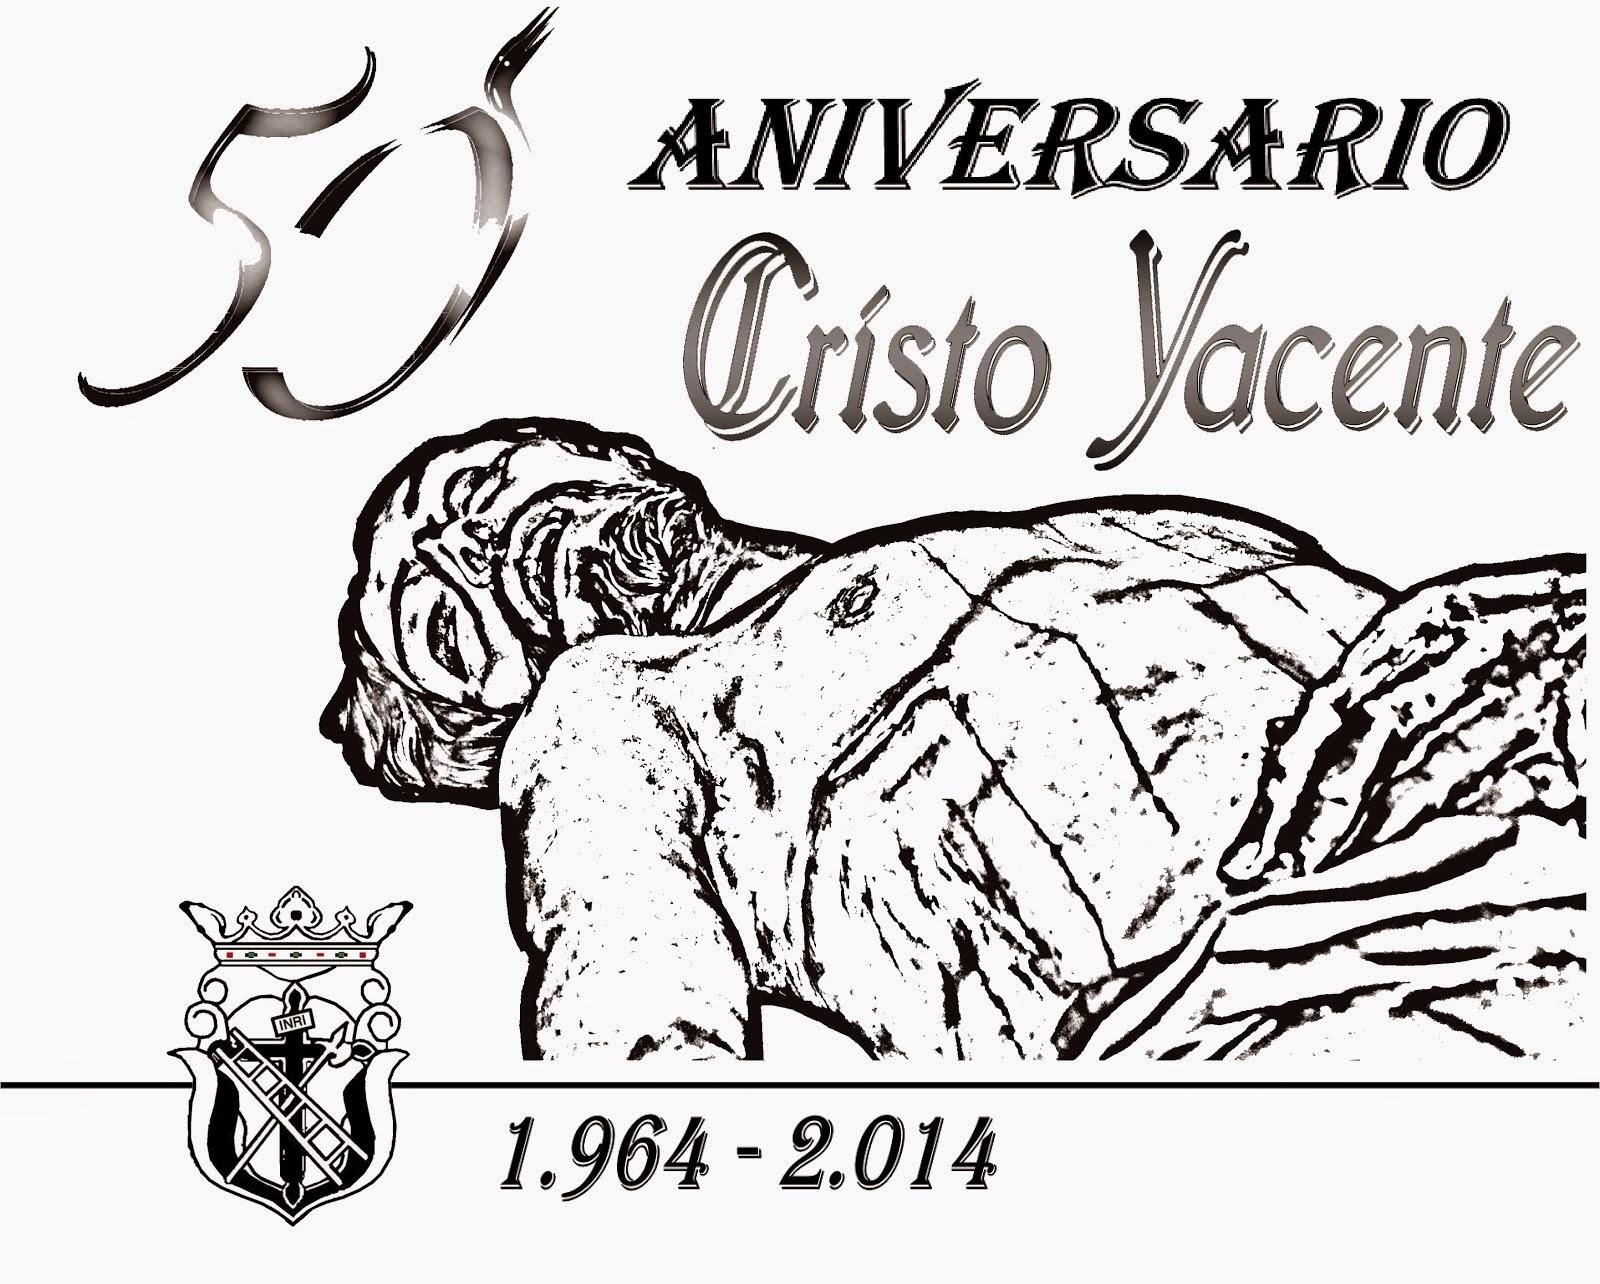 50 Aniversario Cristo Yacente